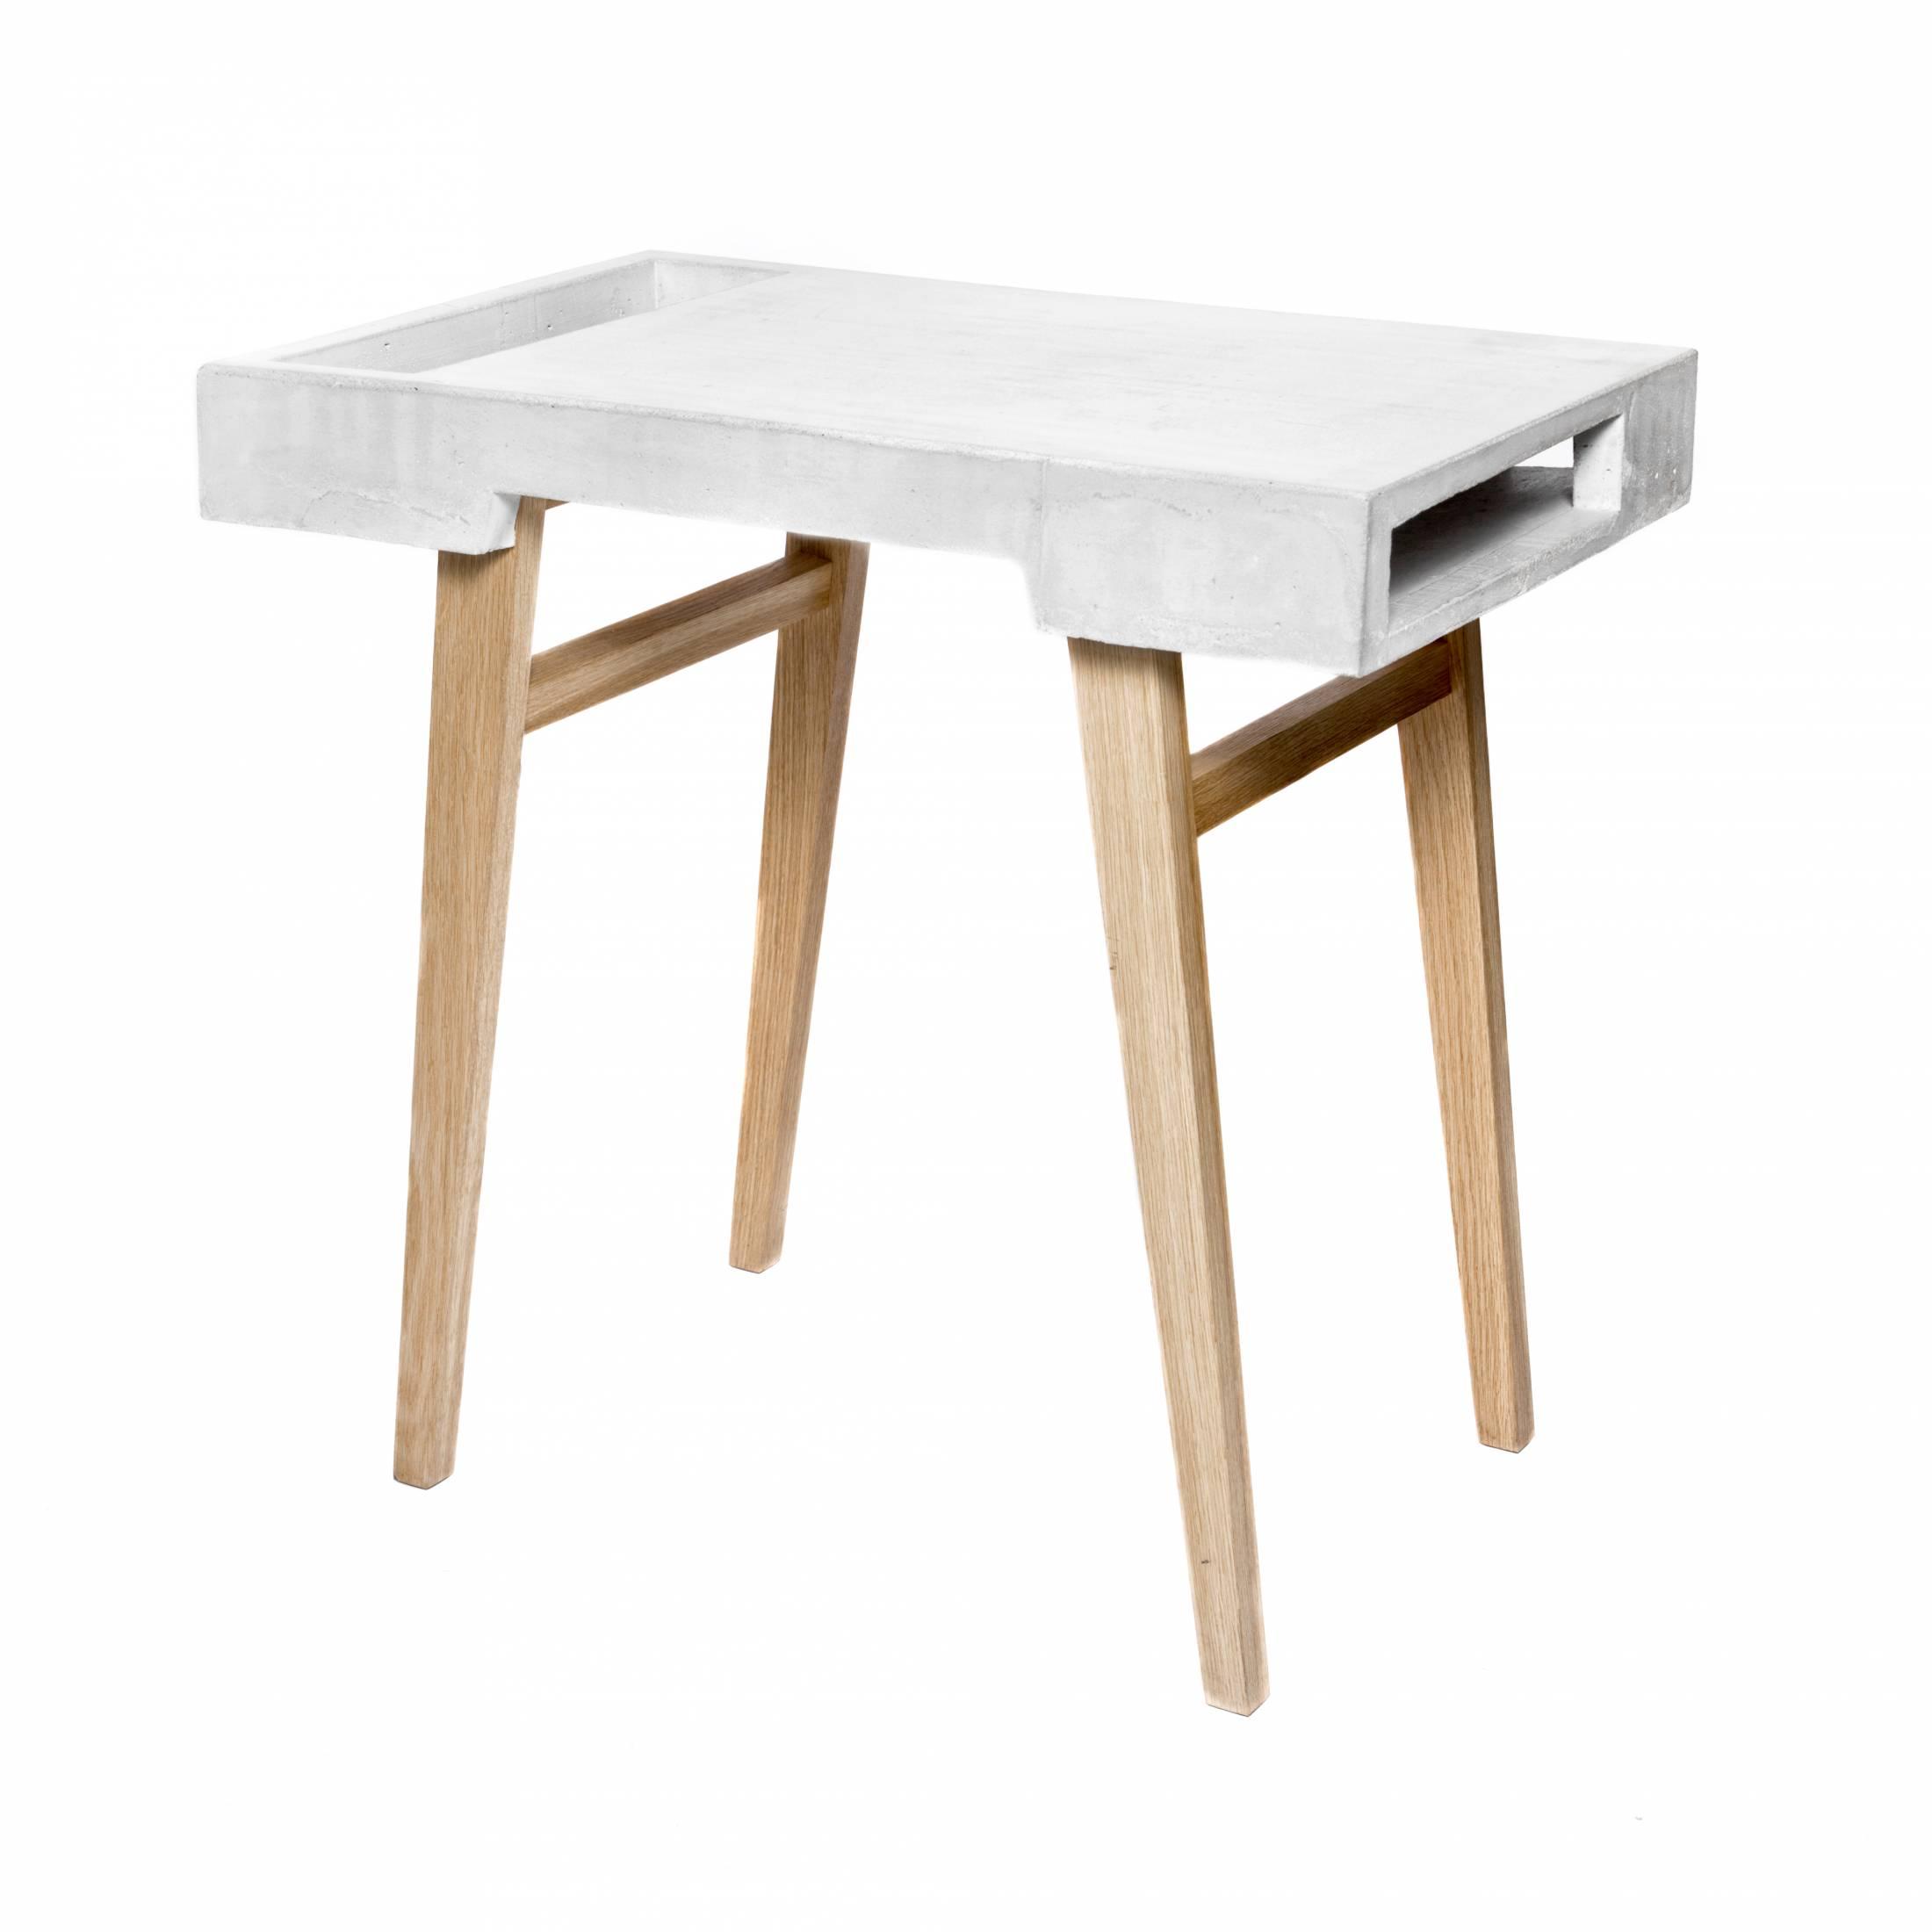 Sigurd-Larsen-Concrete-Table_danish-design-berlin-beton-tisch-by-GeorgRoske-010-1100x1100@2x.jpg